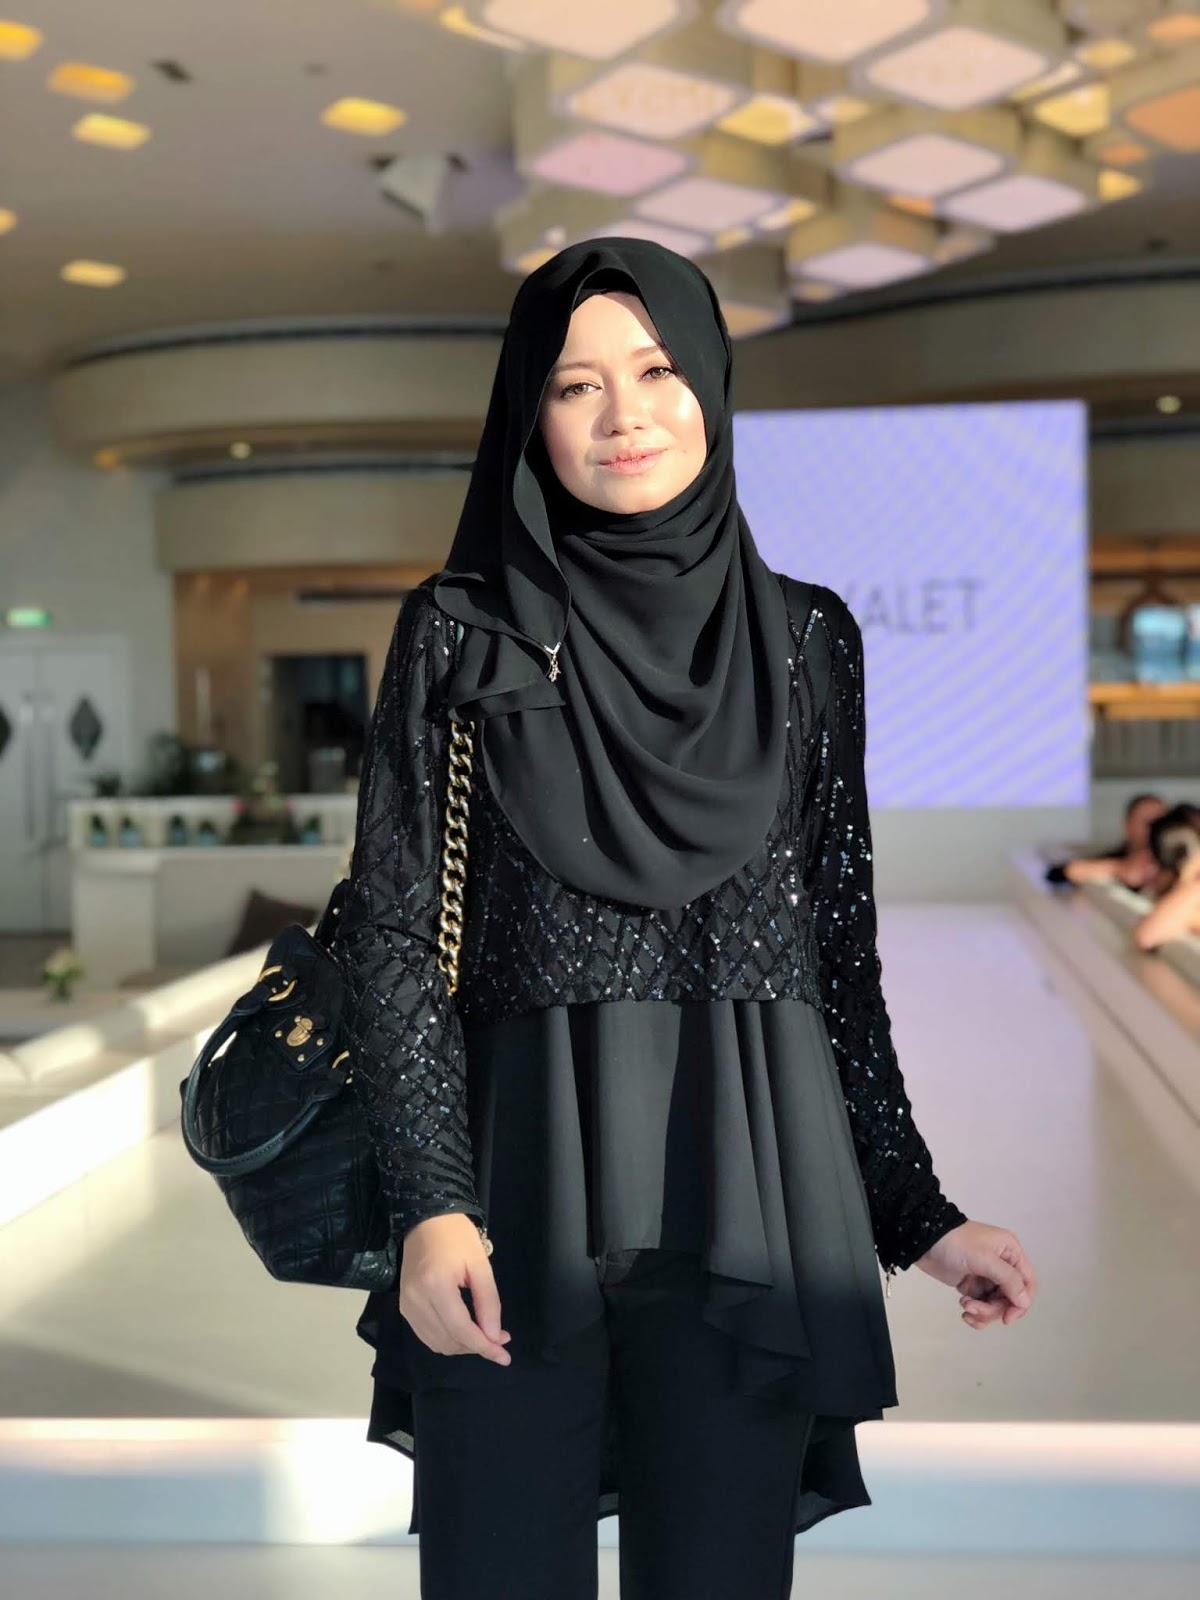 Hijab Tutorial 5 : Video : On-The-Go Hijab Style - R Nadia Sabrina